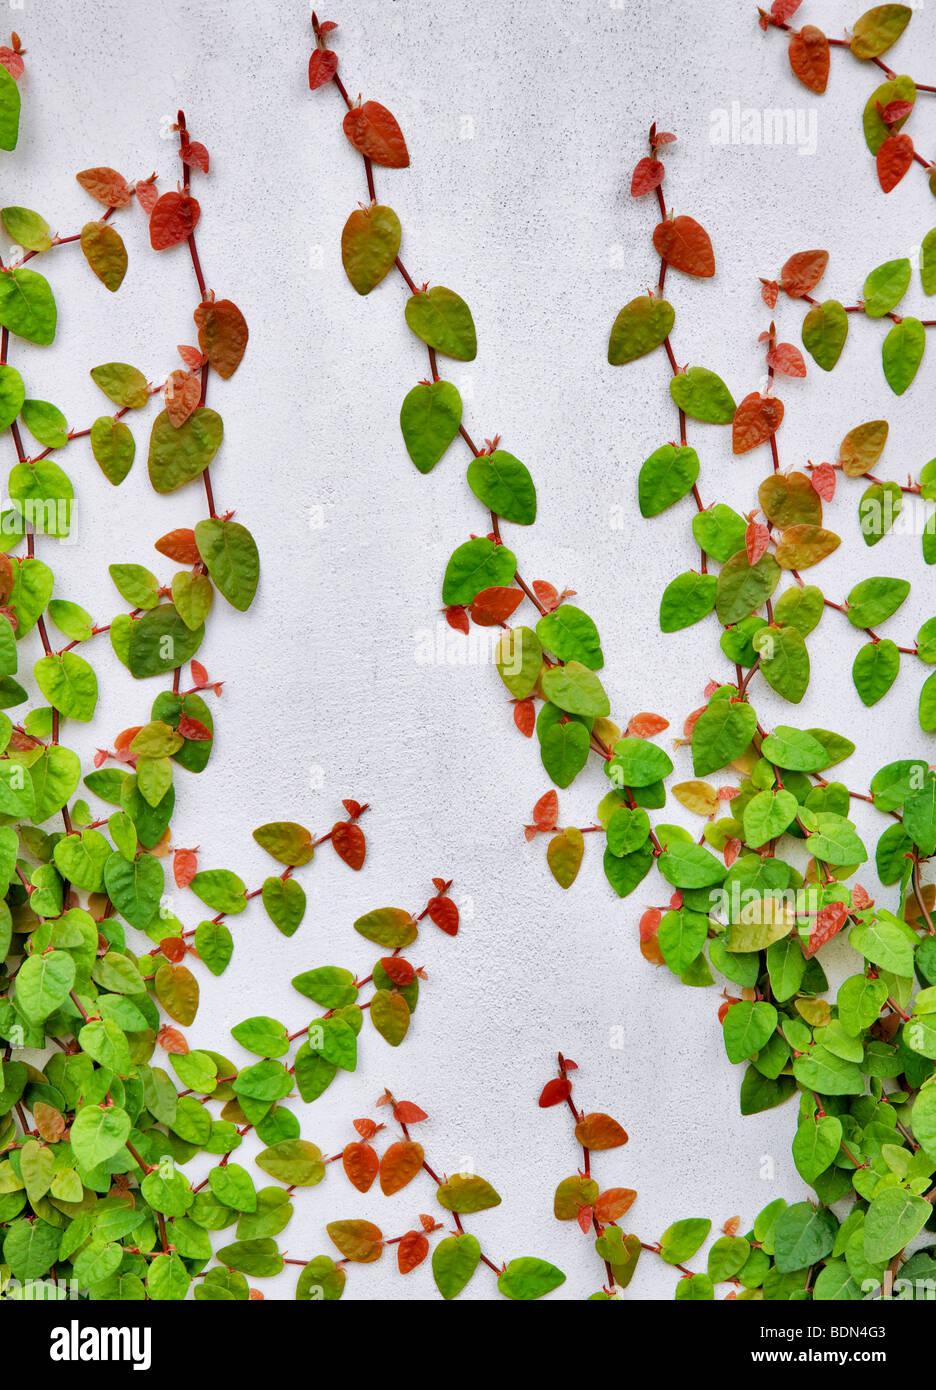 Climbing vine on white wall. Los Angeles, CA - Stock Image